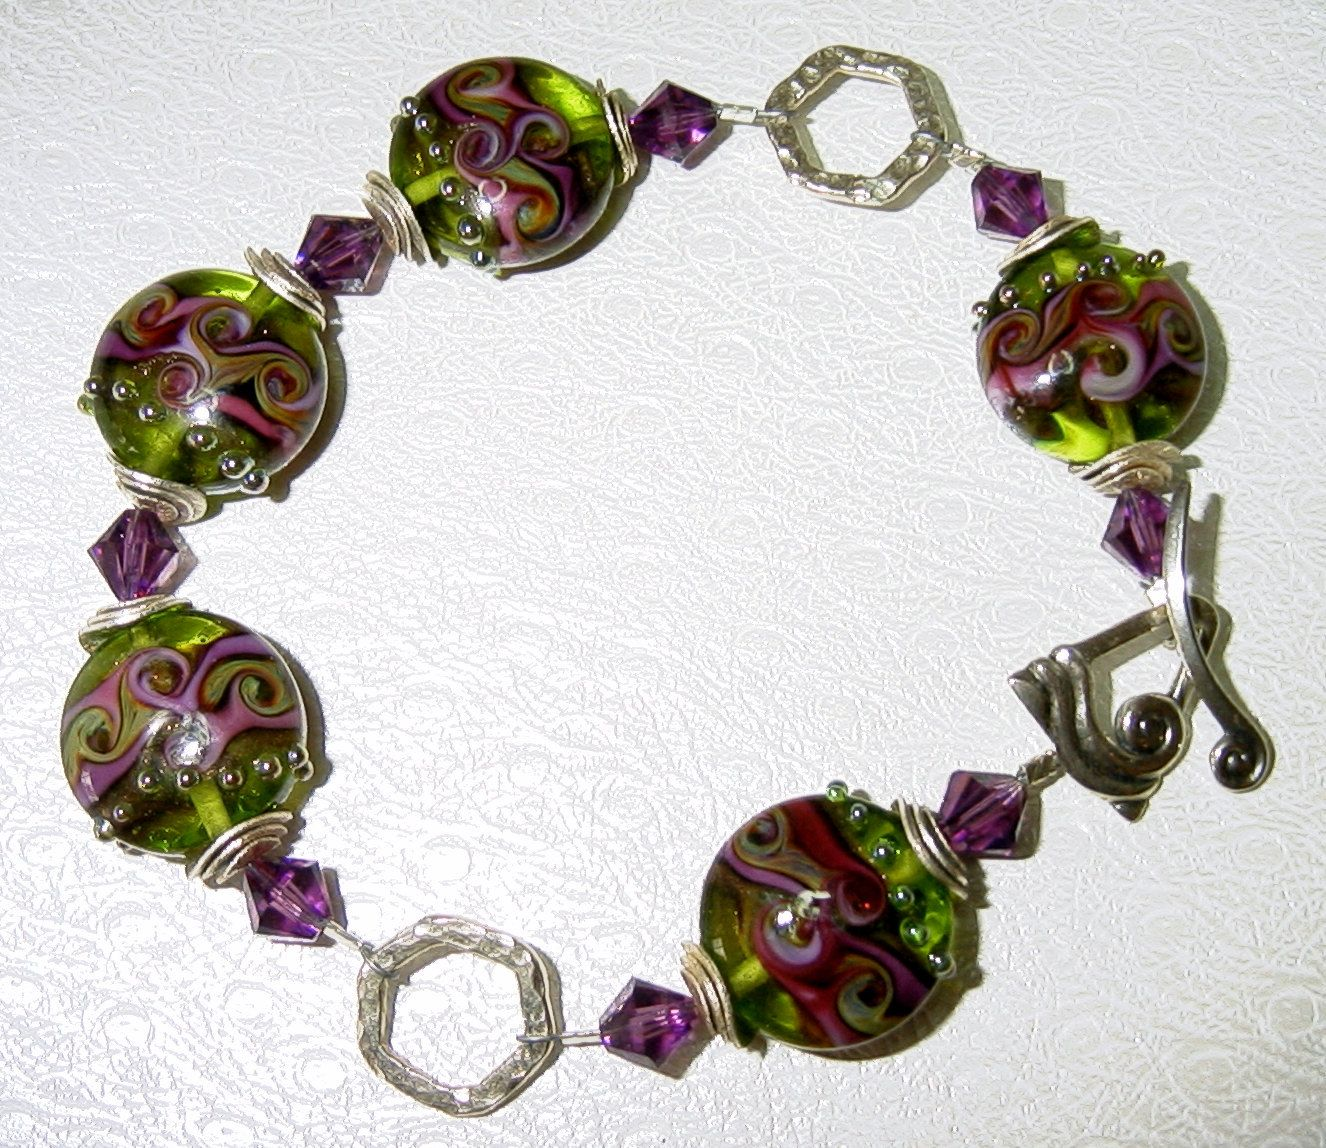 Beautiful Lampwork Sterling Silver Swarovski Crystals Large Size Bracelet by judesjujus on Etsy